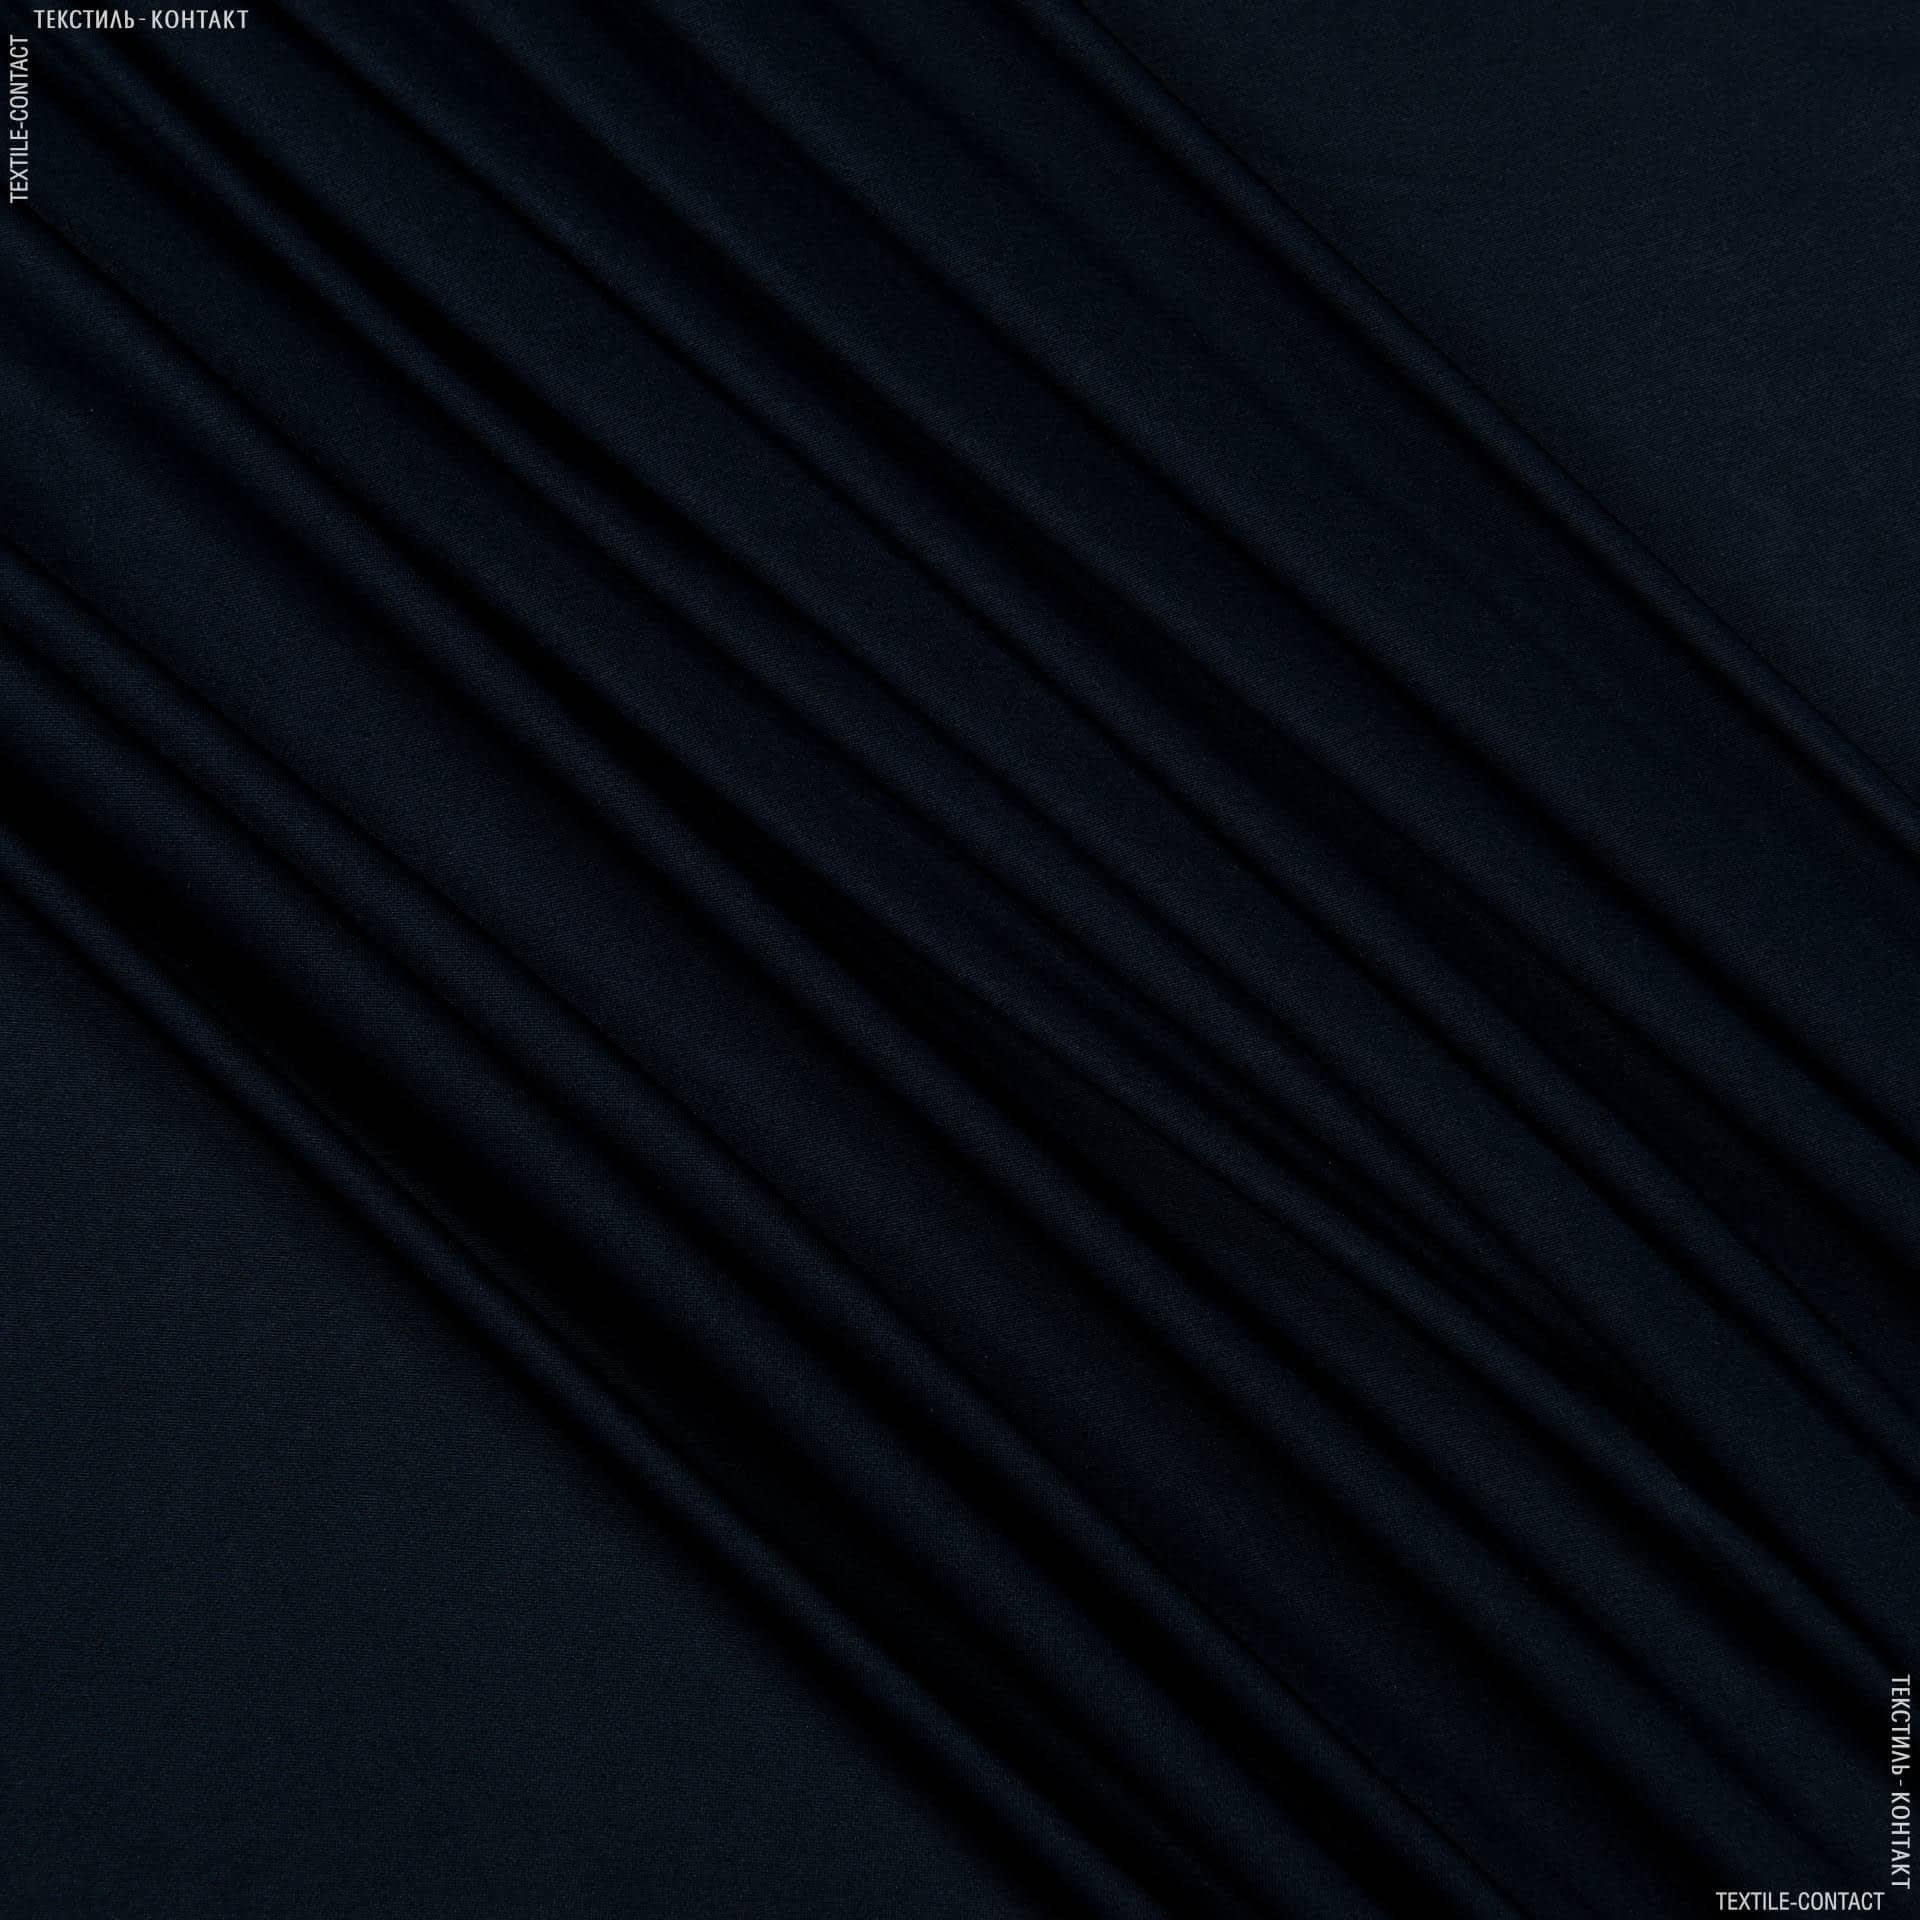 Ткани для платьев - Трикотаж жасмин вороново крыло